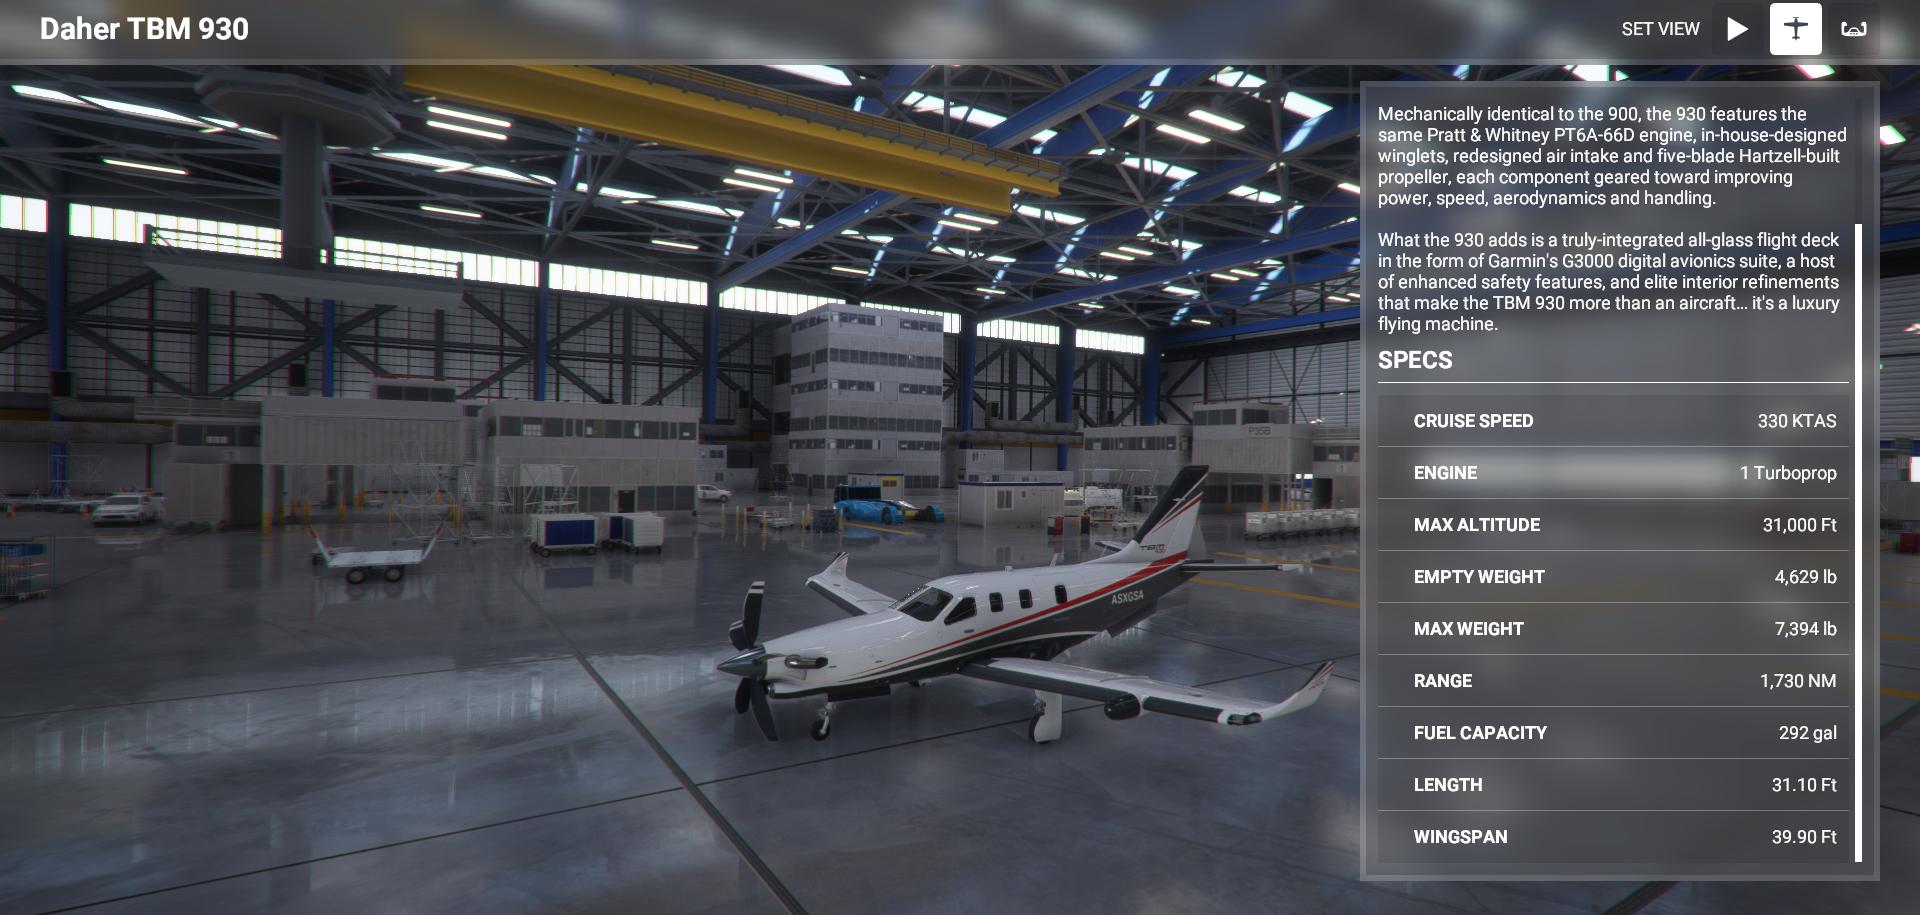 Microsoft Flight Simulator Daher Tbm 930